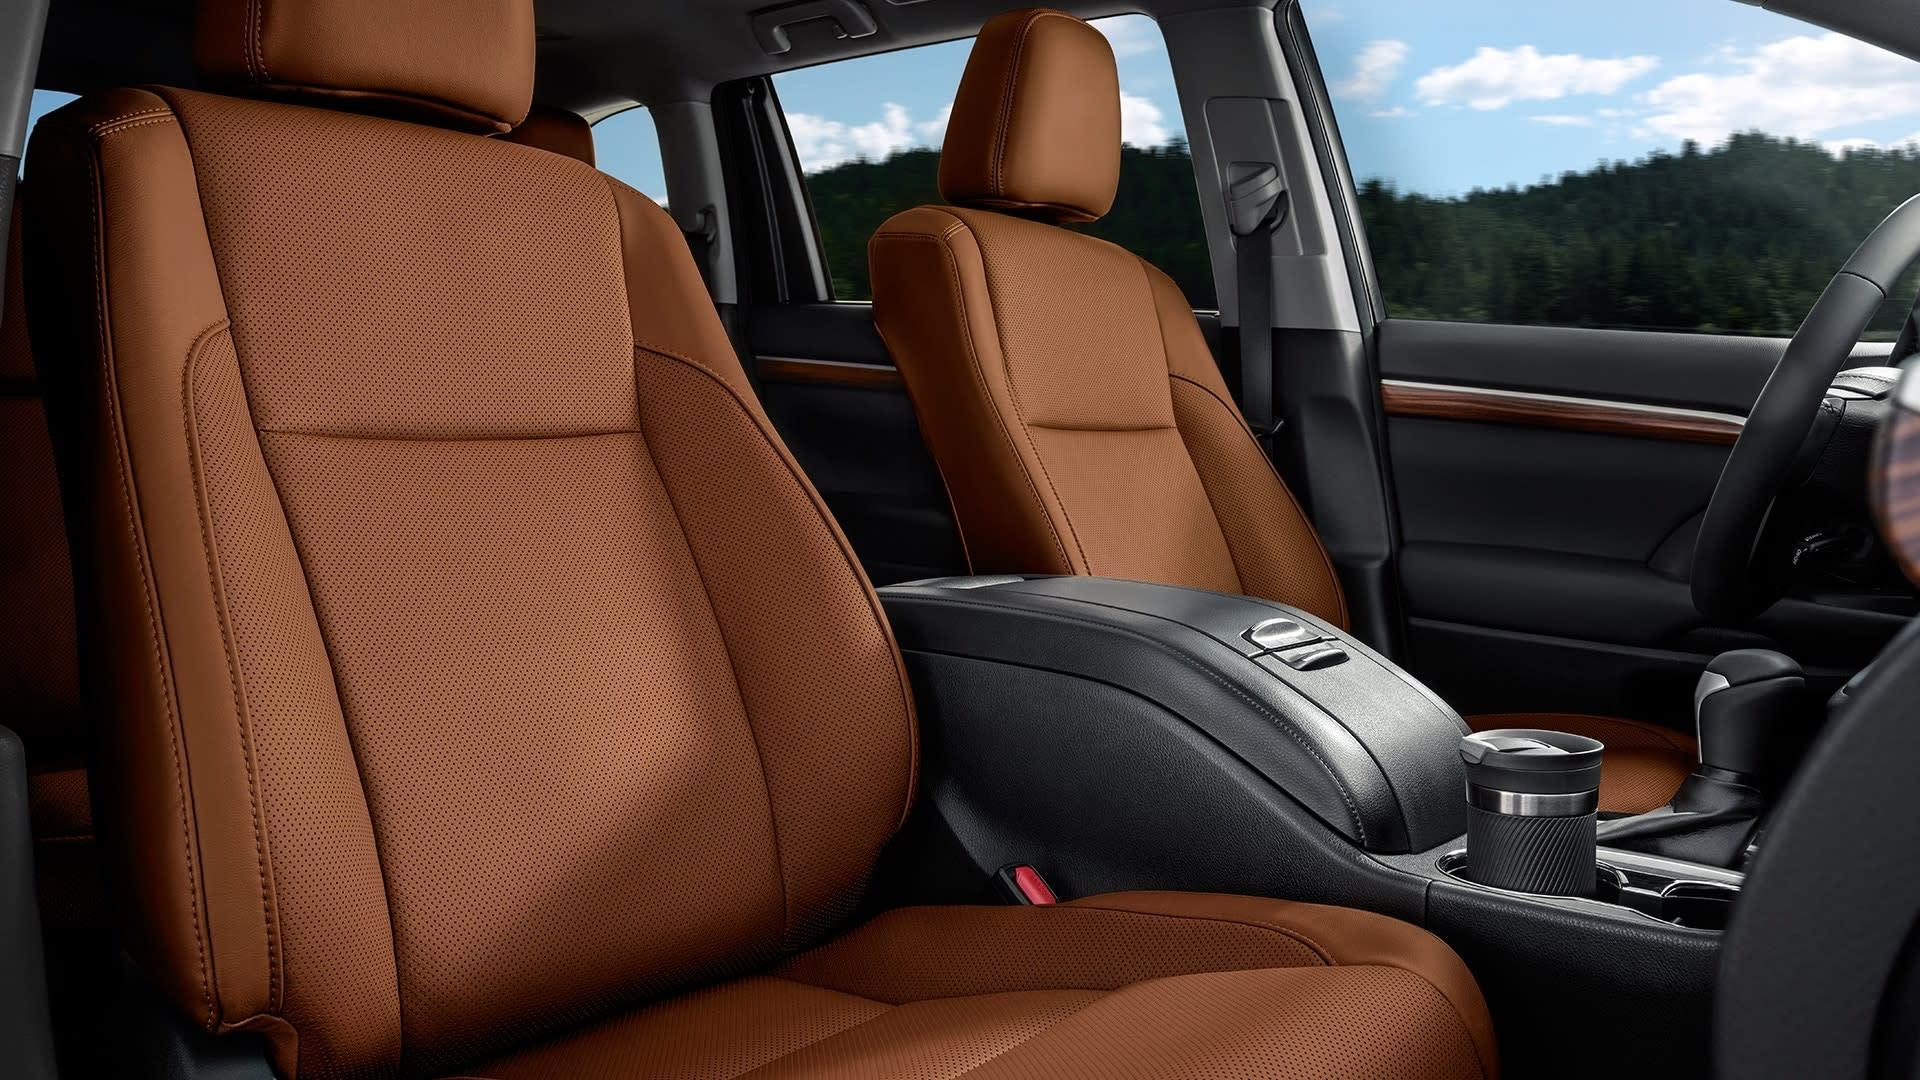 2019 Toyota Highlander Vs Honda Pilot Interior near Owensboro, KY